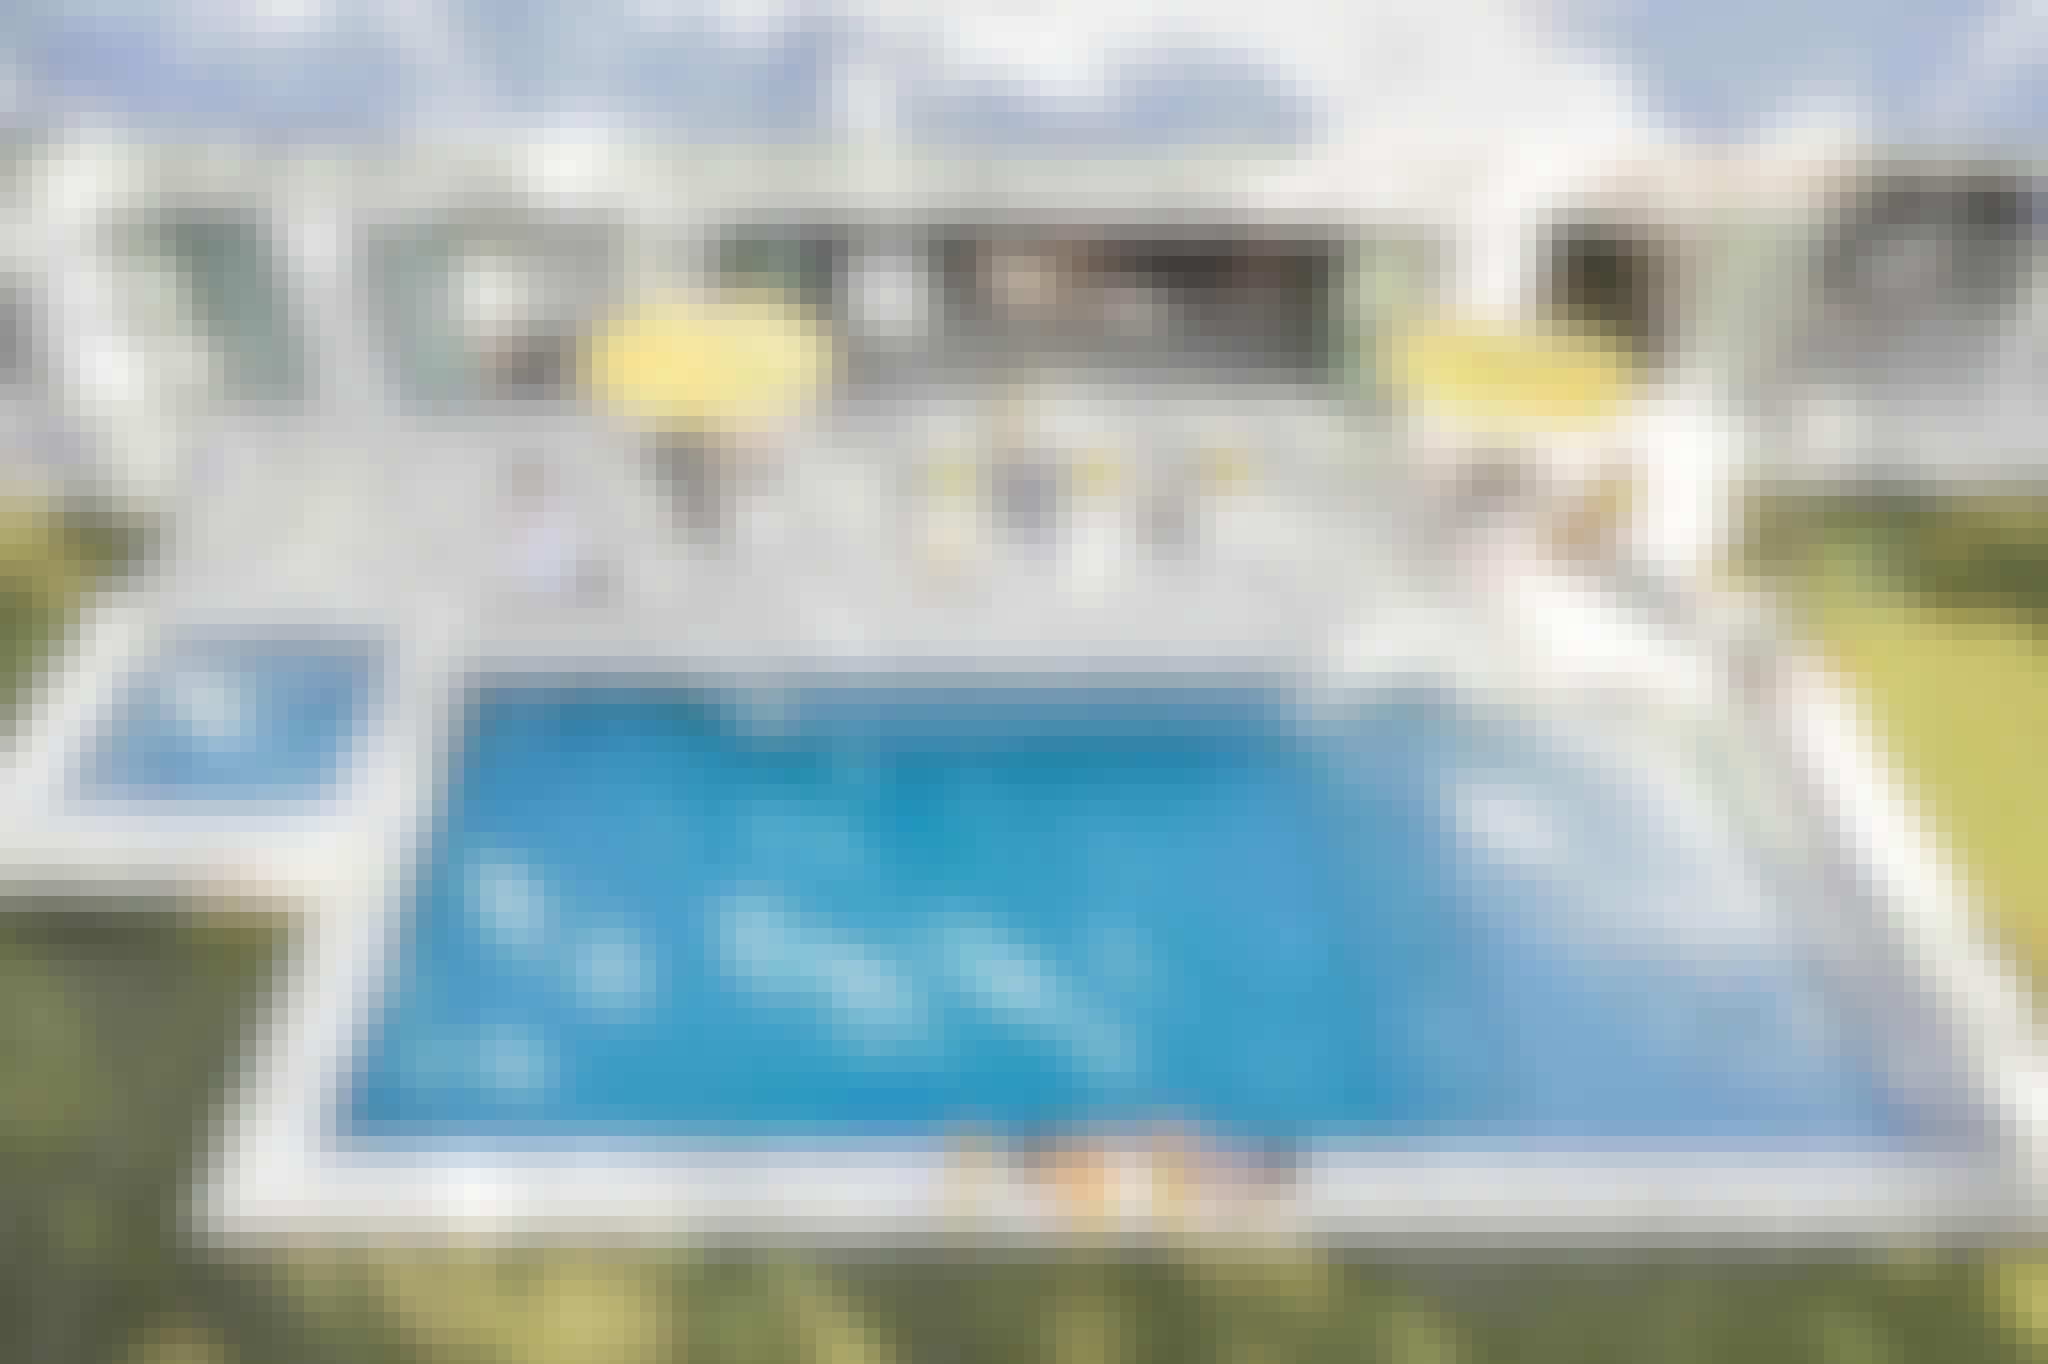 accordion glass doors in pool house design